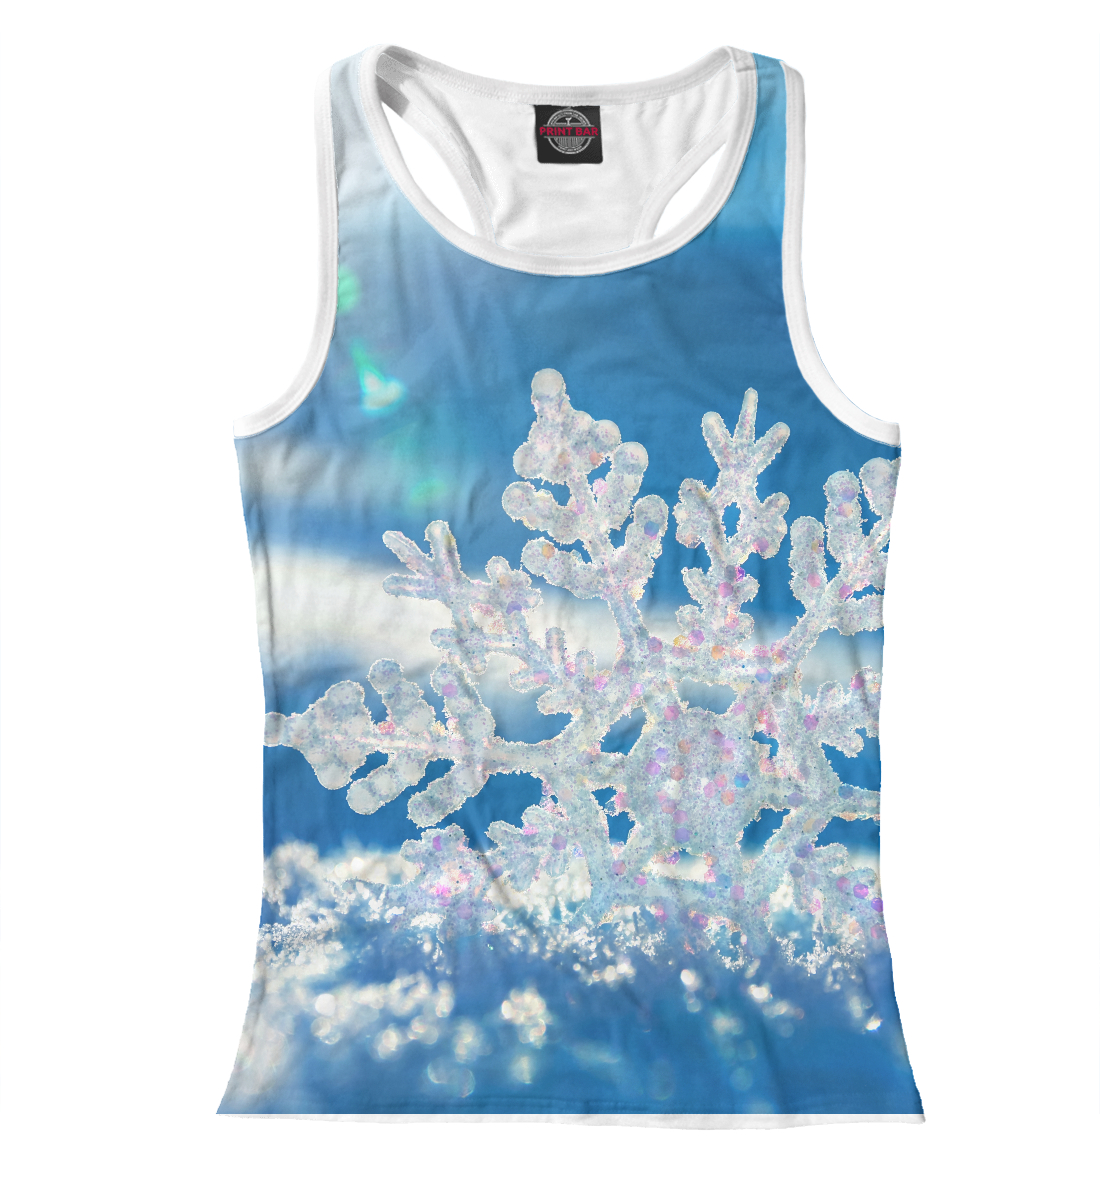 Купить Майка для девочки Снежинка MAC-534960-mayb-1